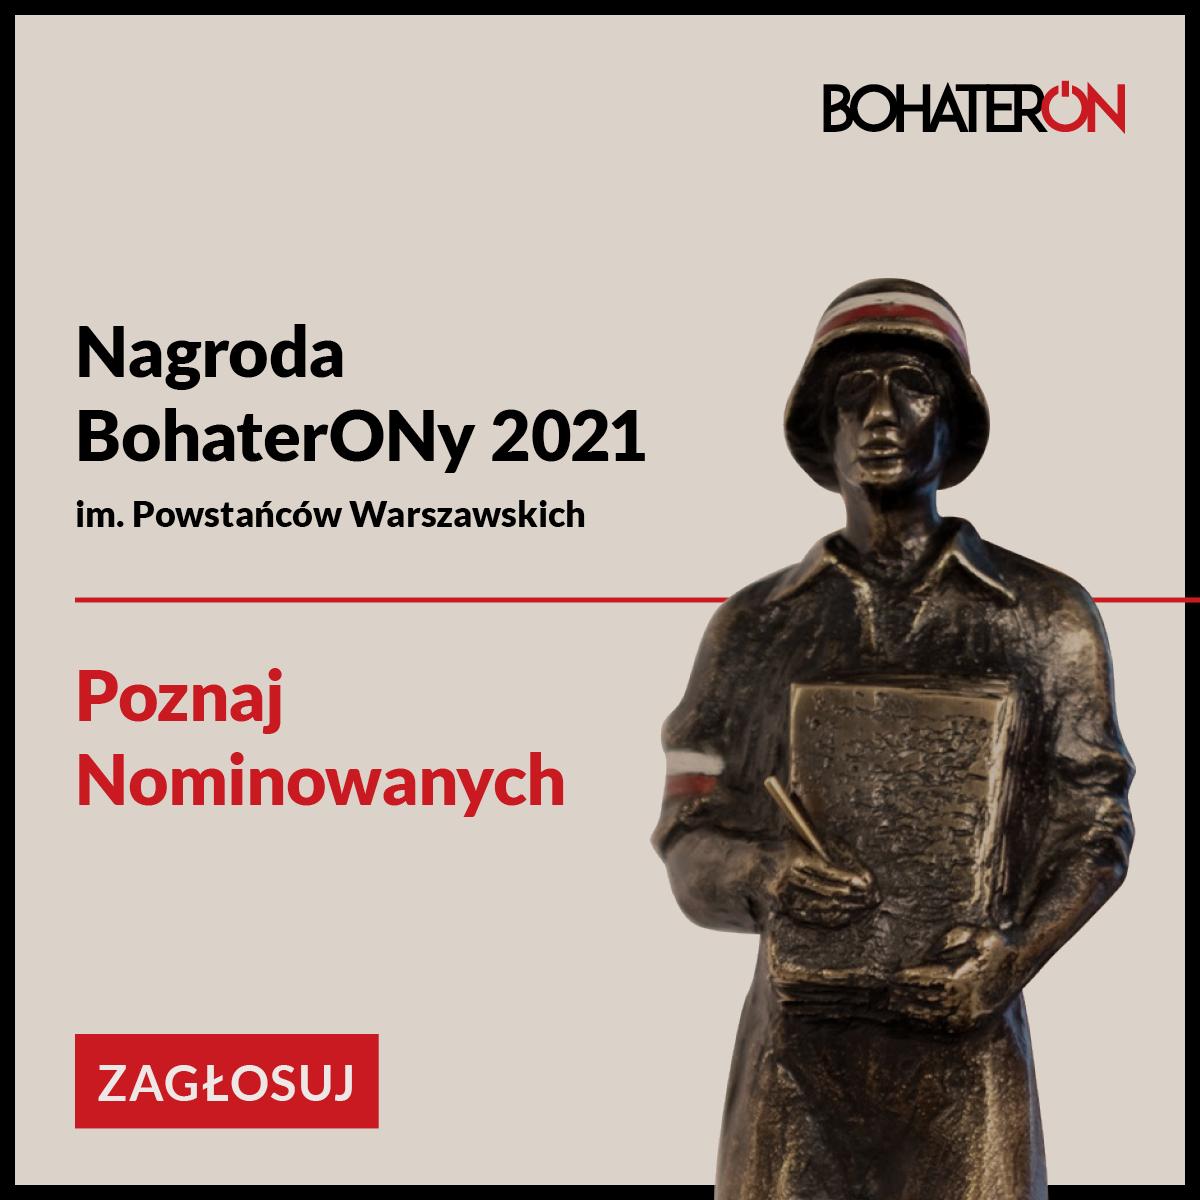 CDZWiP nominowane do nagrody BohaterON 2021